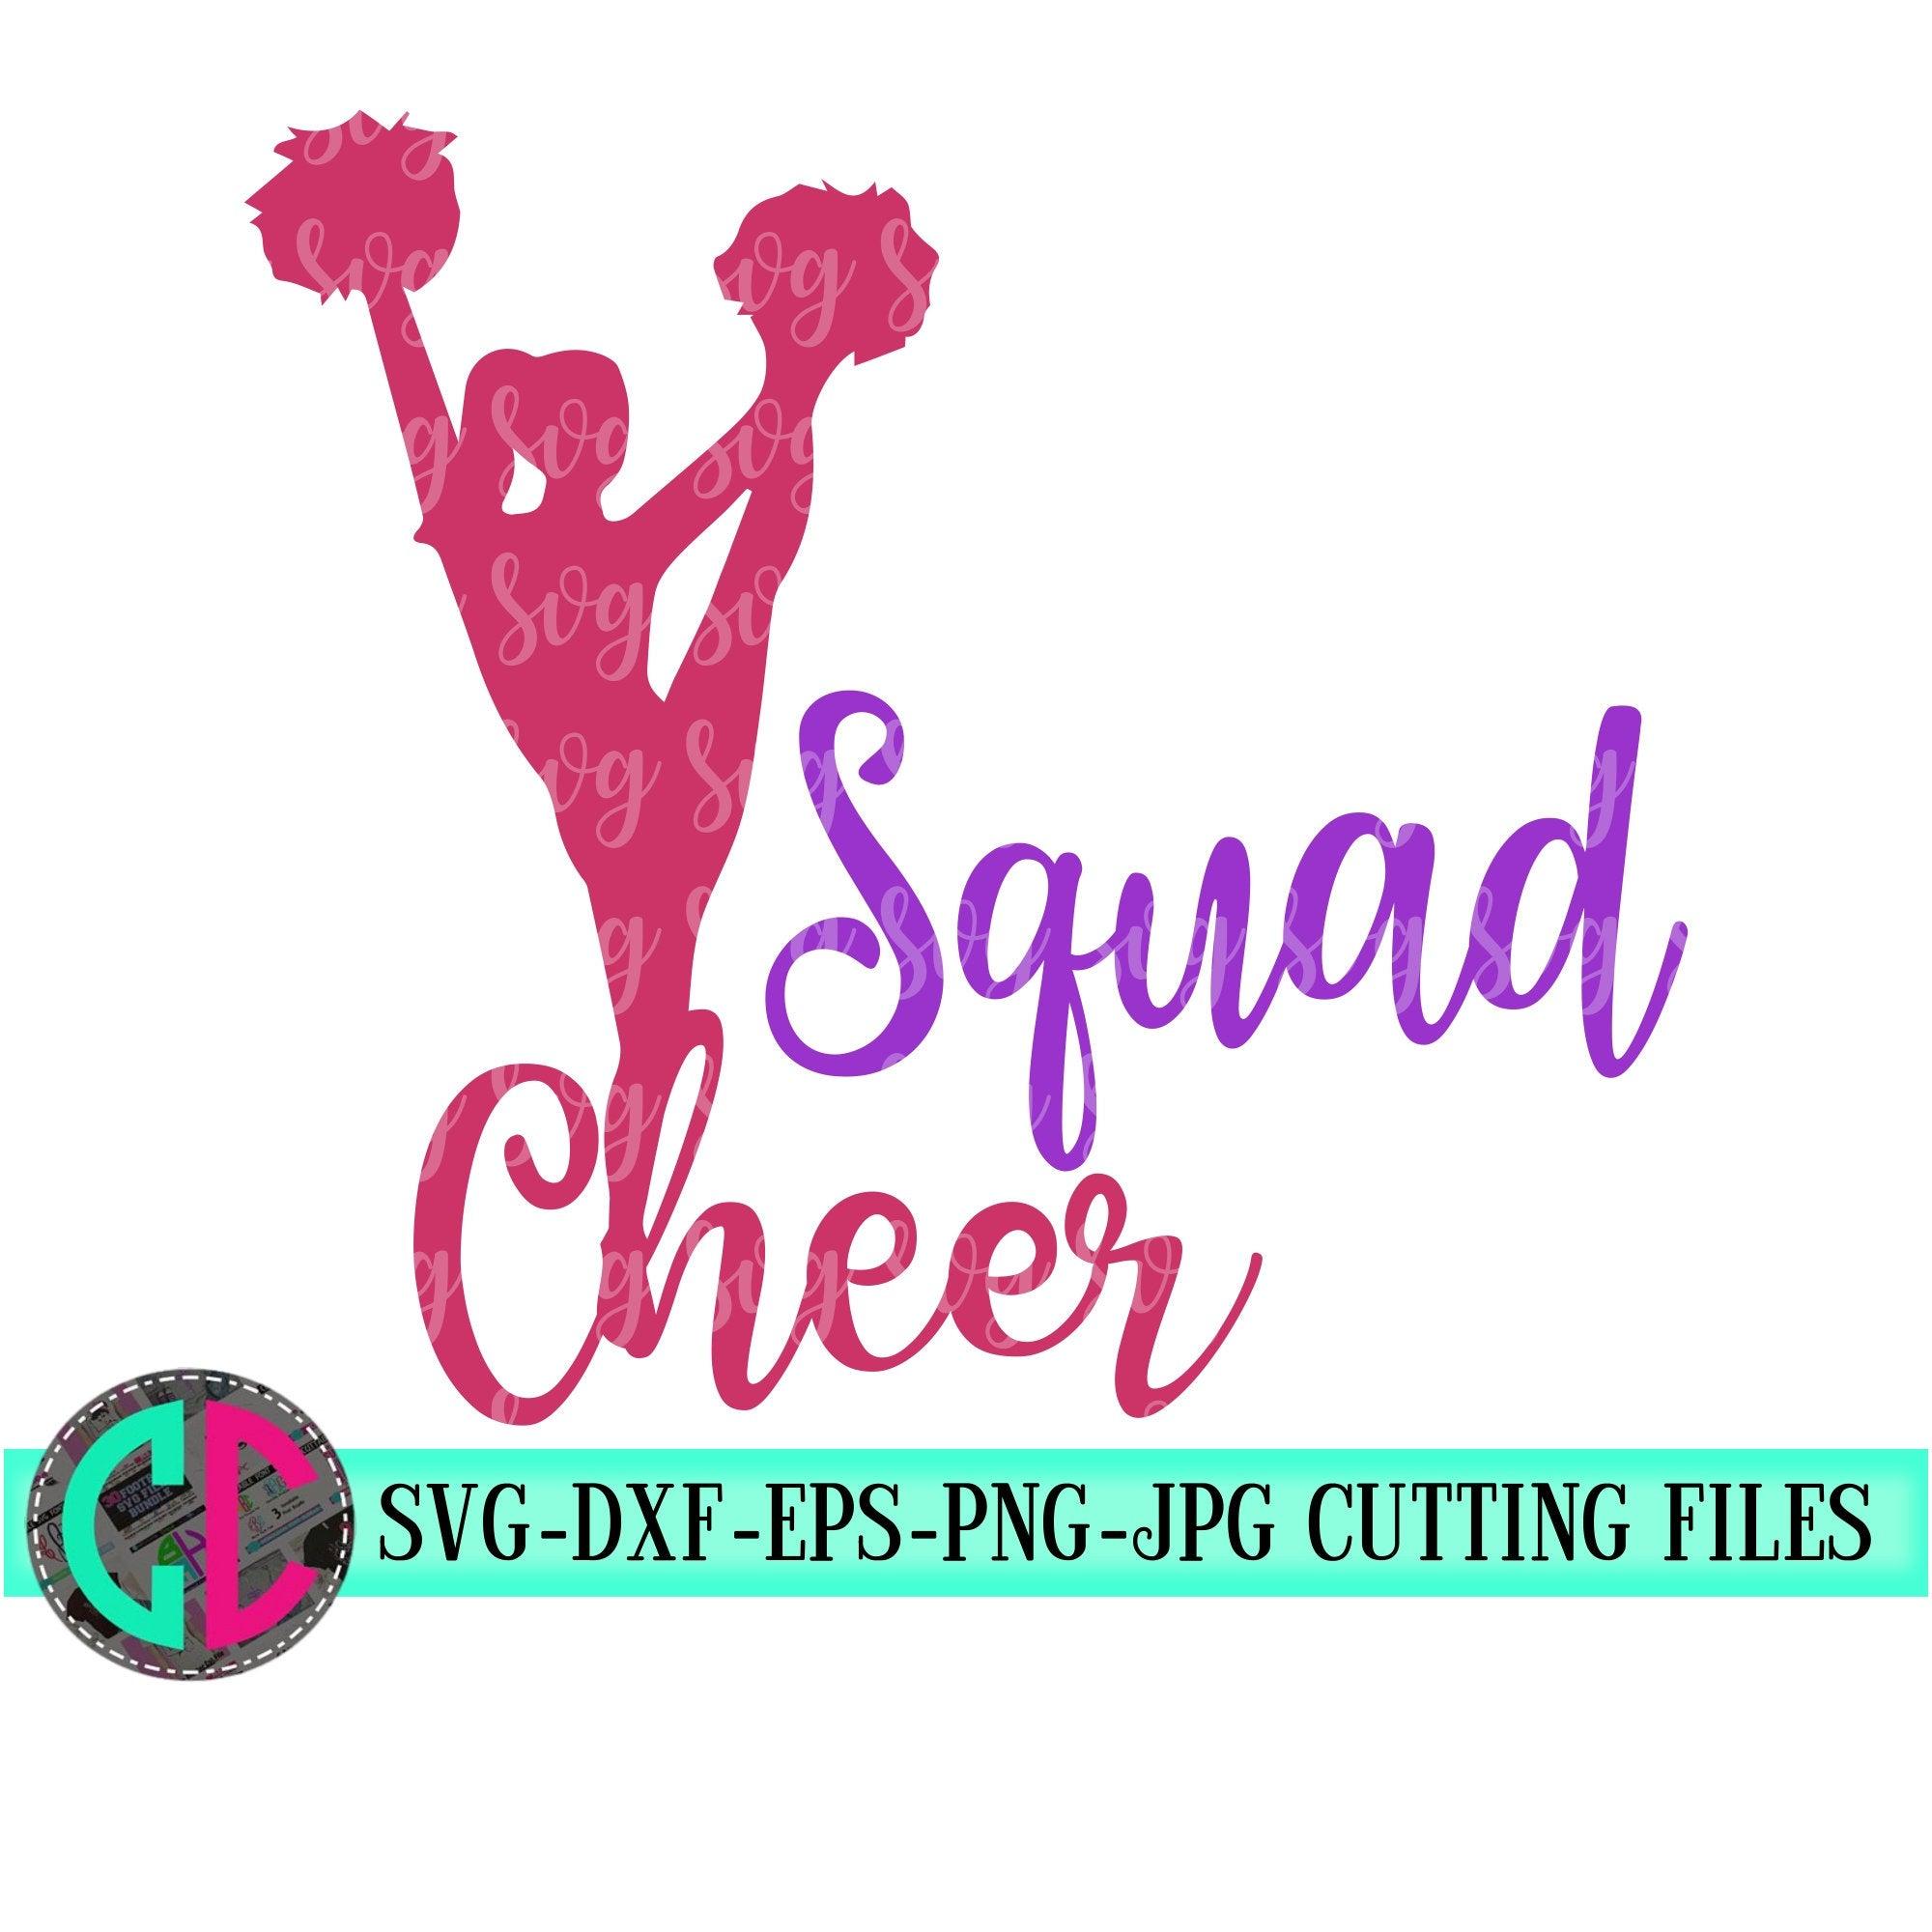 Cheerleader Squad Svg Cheerleader Svg Cheer Svg Football Svg Cheerleading Svg Cheerleader Cut File Cheer Mom Svg Cheer Svg For Cricut Svg For Cricut